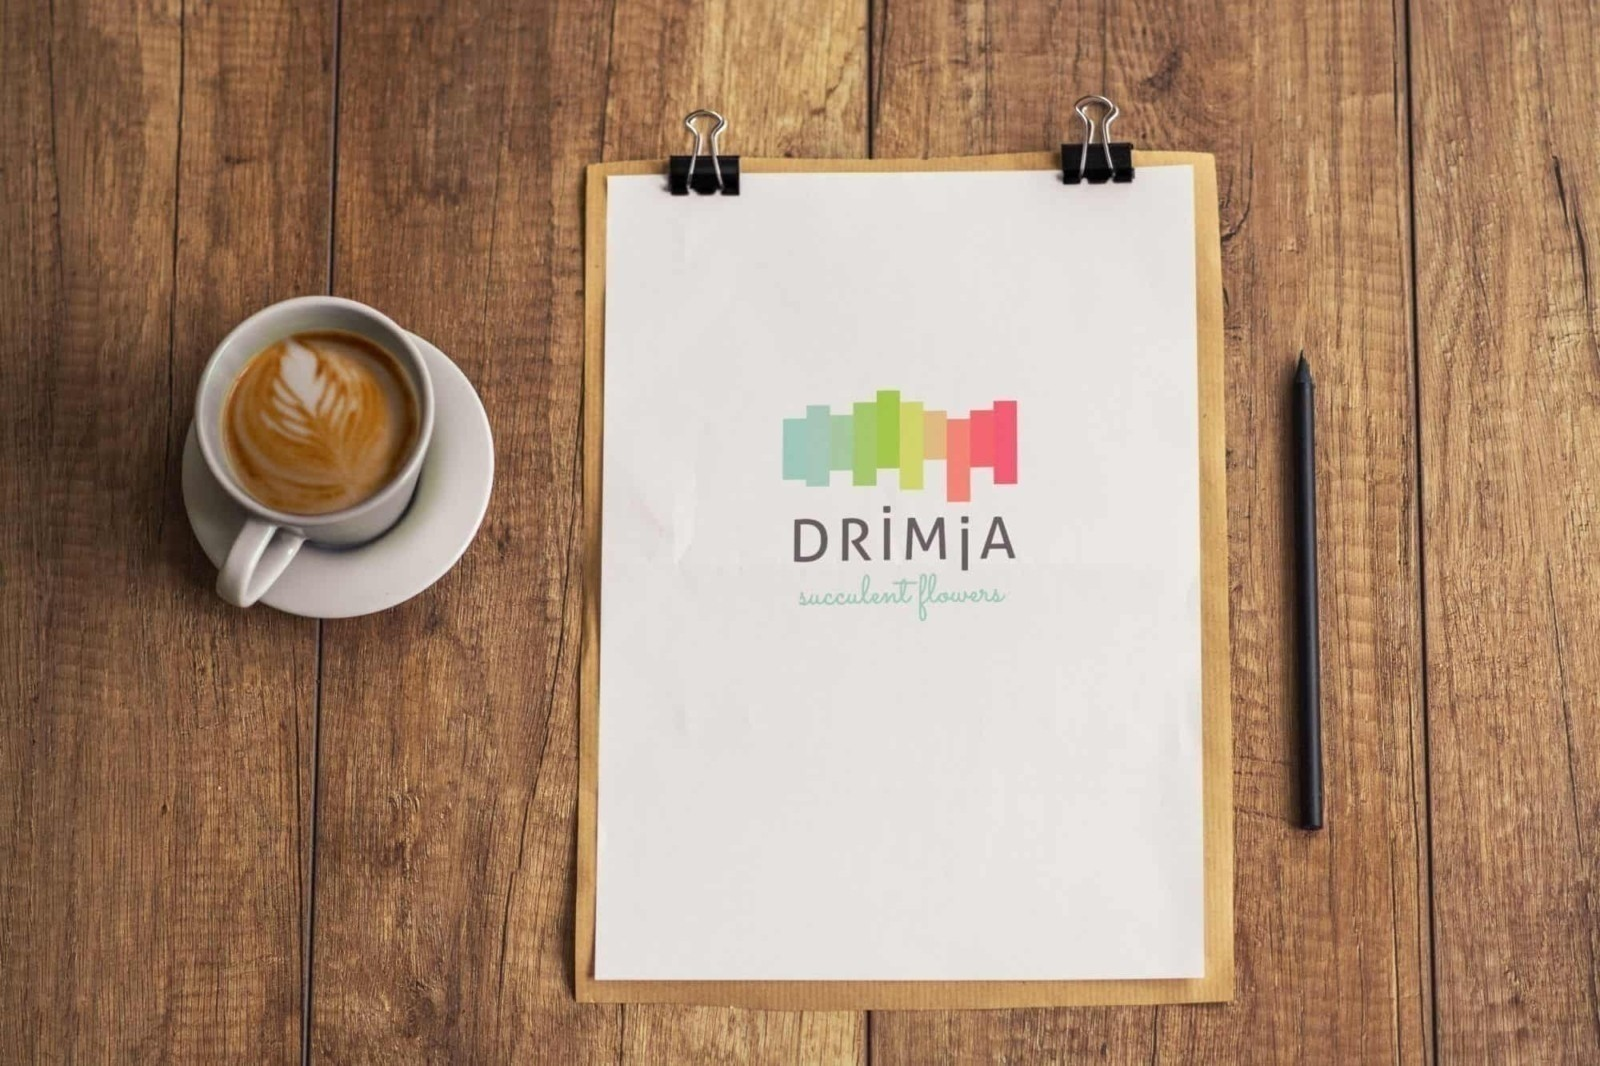 Drimia, brand identity process, suculent flowers, branding